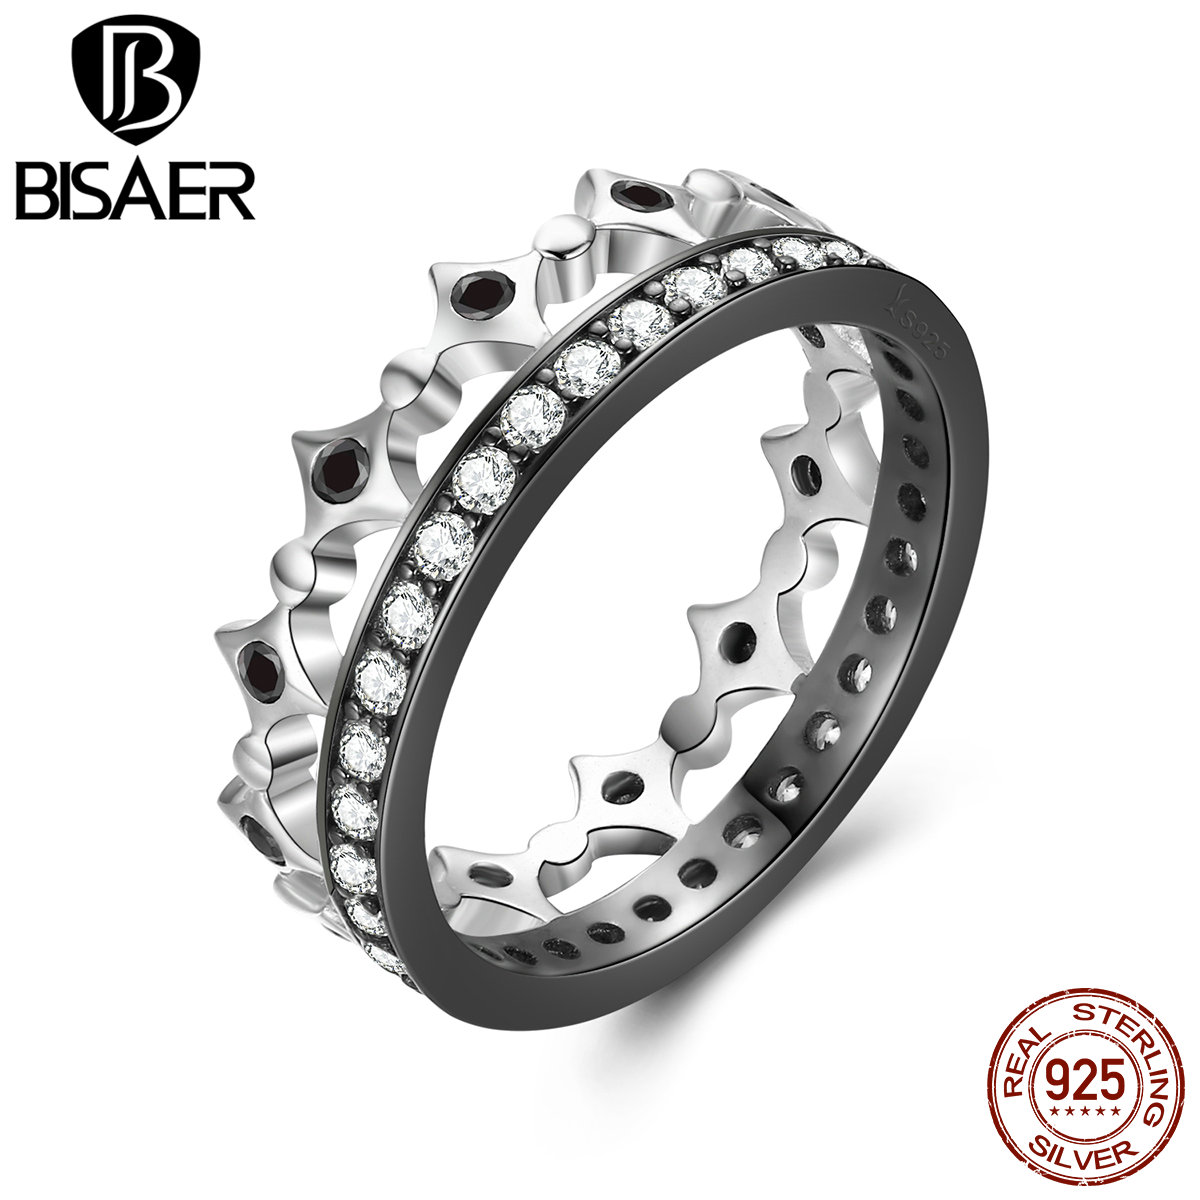 BISAER Genuine 925 Sterling Silver Light Of Freedom Crown Shape Black Zirconia Wedding Rings For Women Fashion Jewelry ECR056